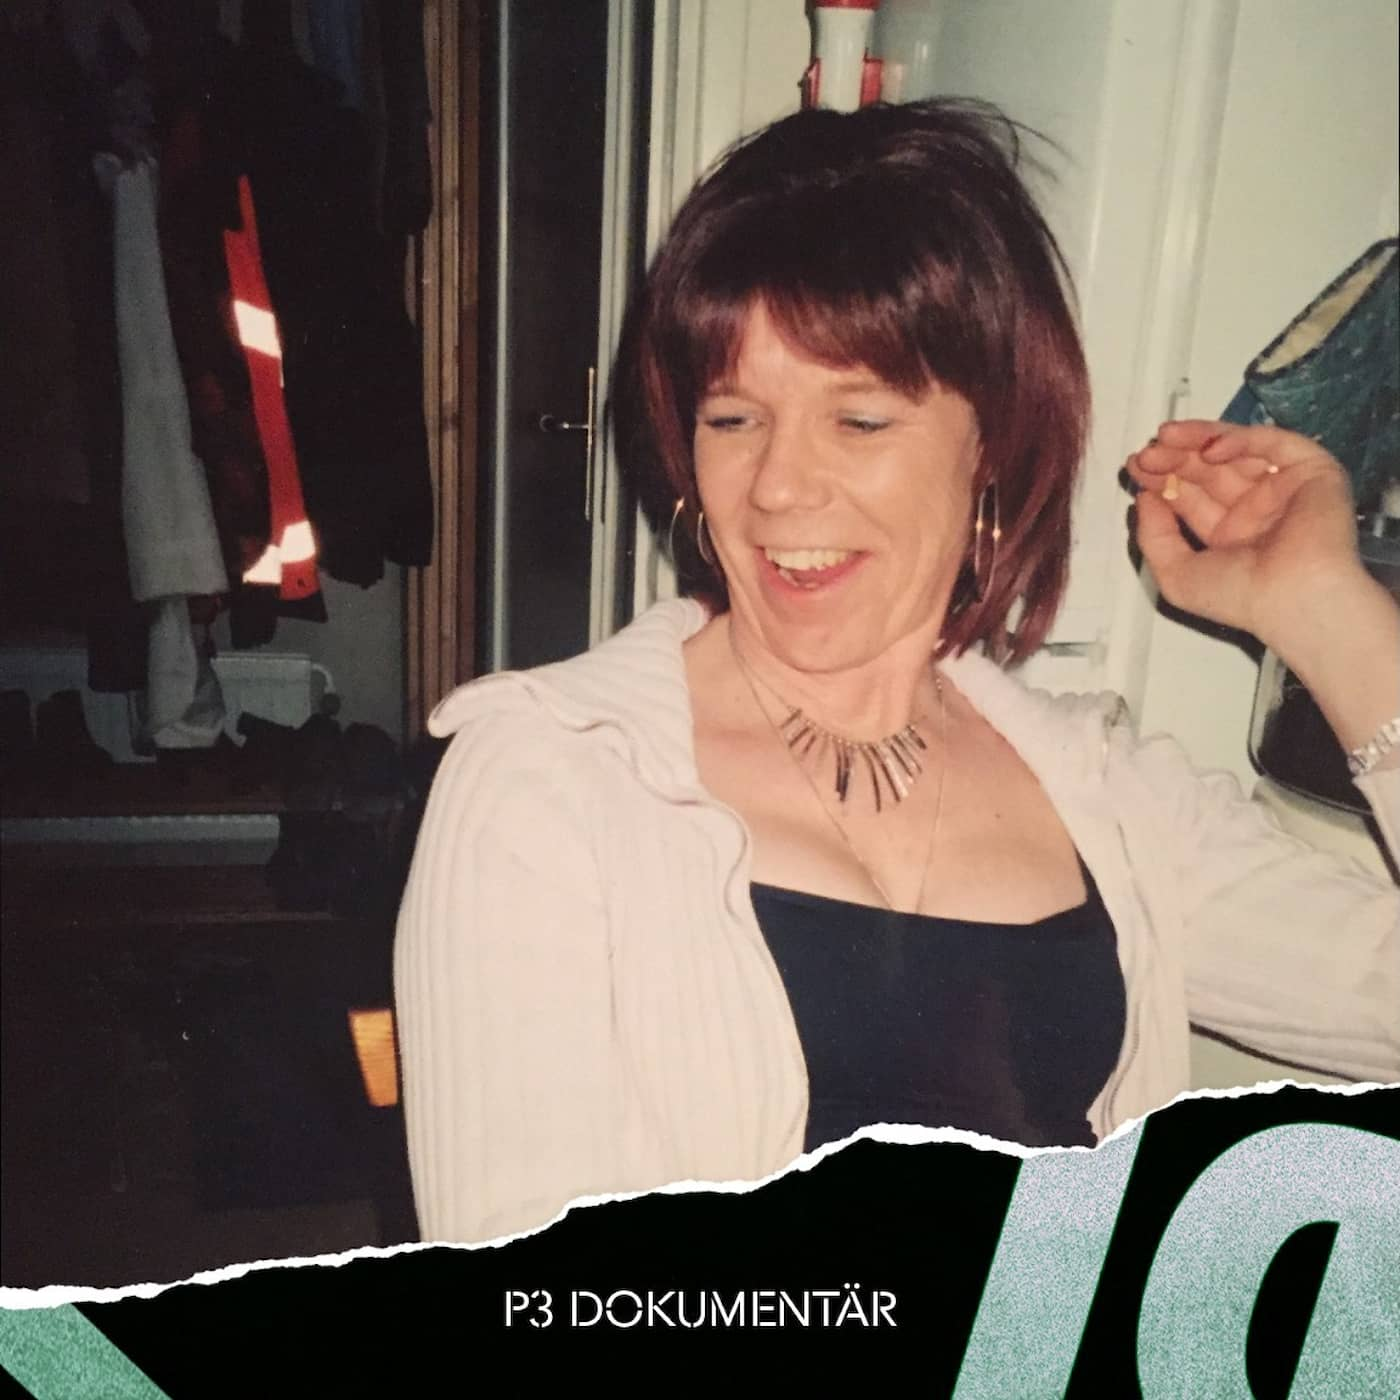 *NY* Mordet på Madeleine Delbom i Långshyttan